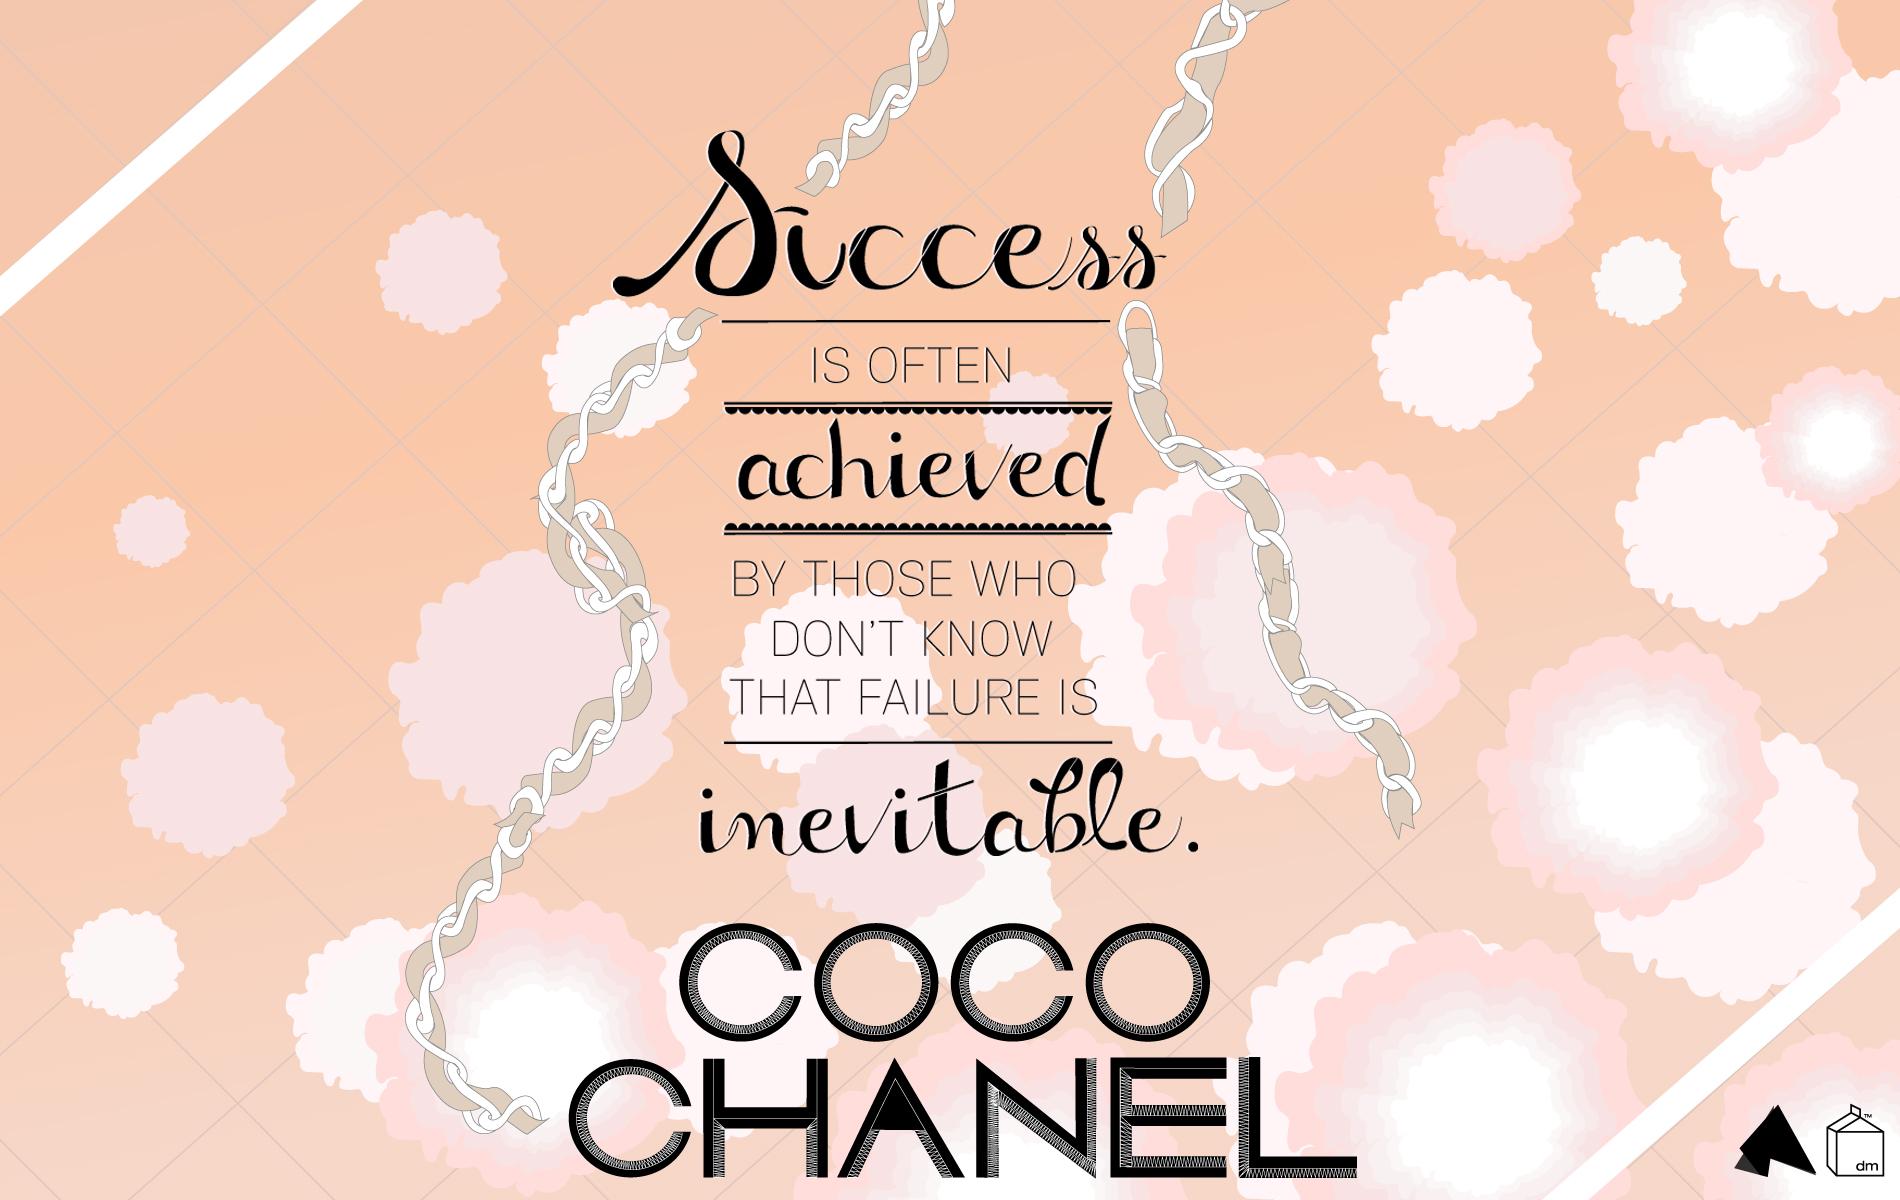 chanel quotes desktop wallpaper quotesgram